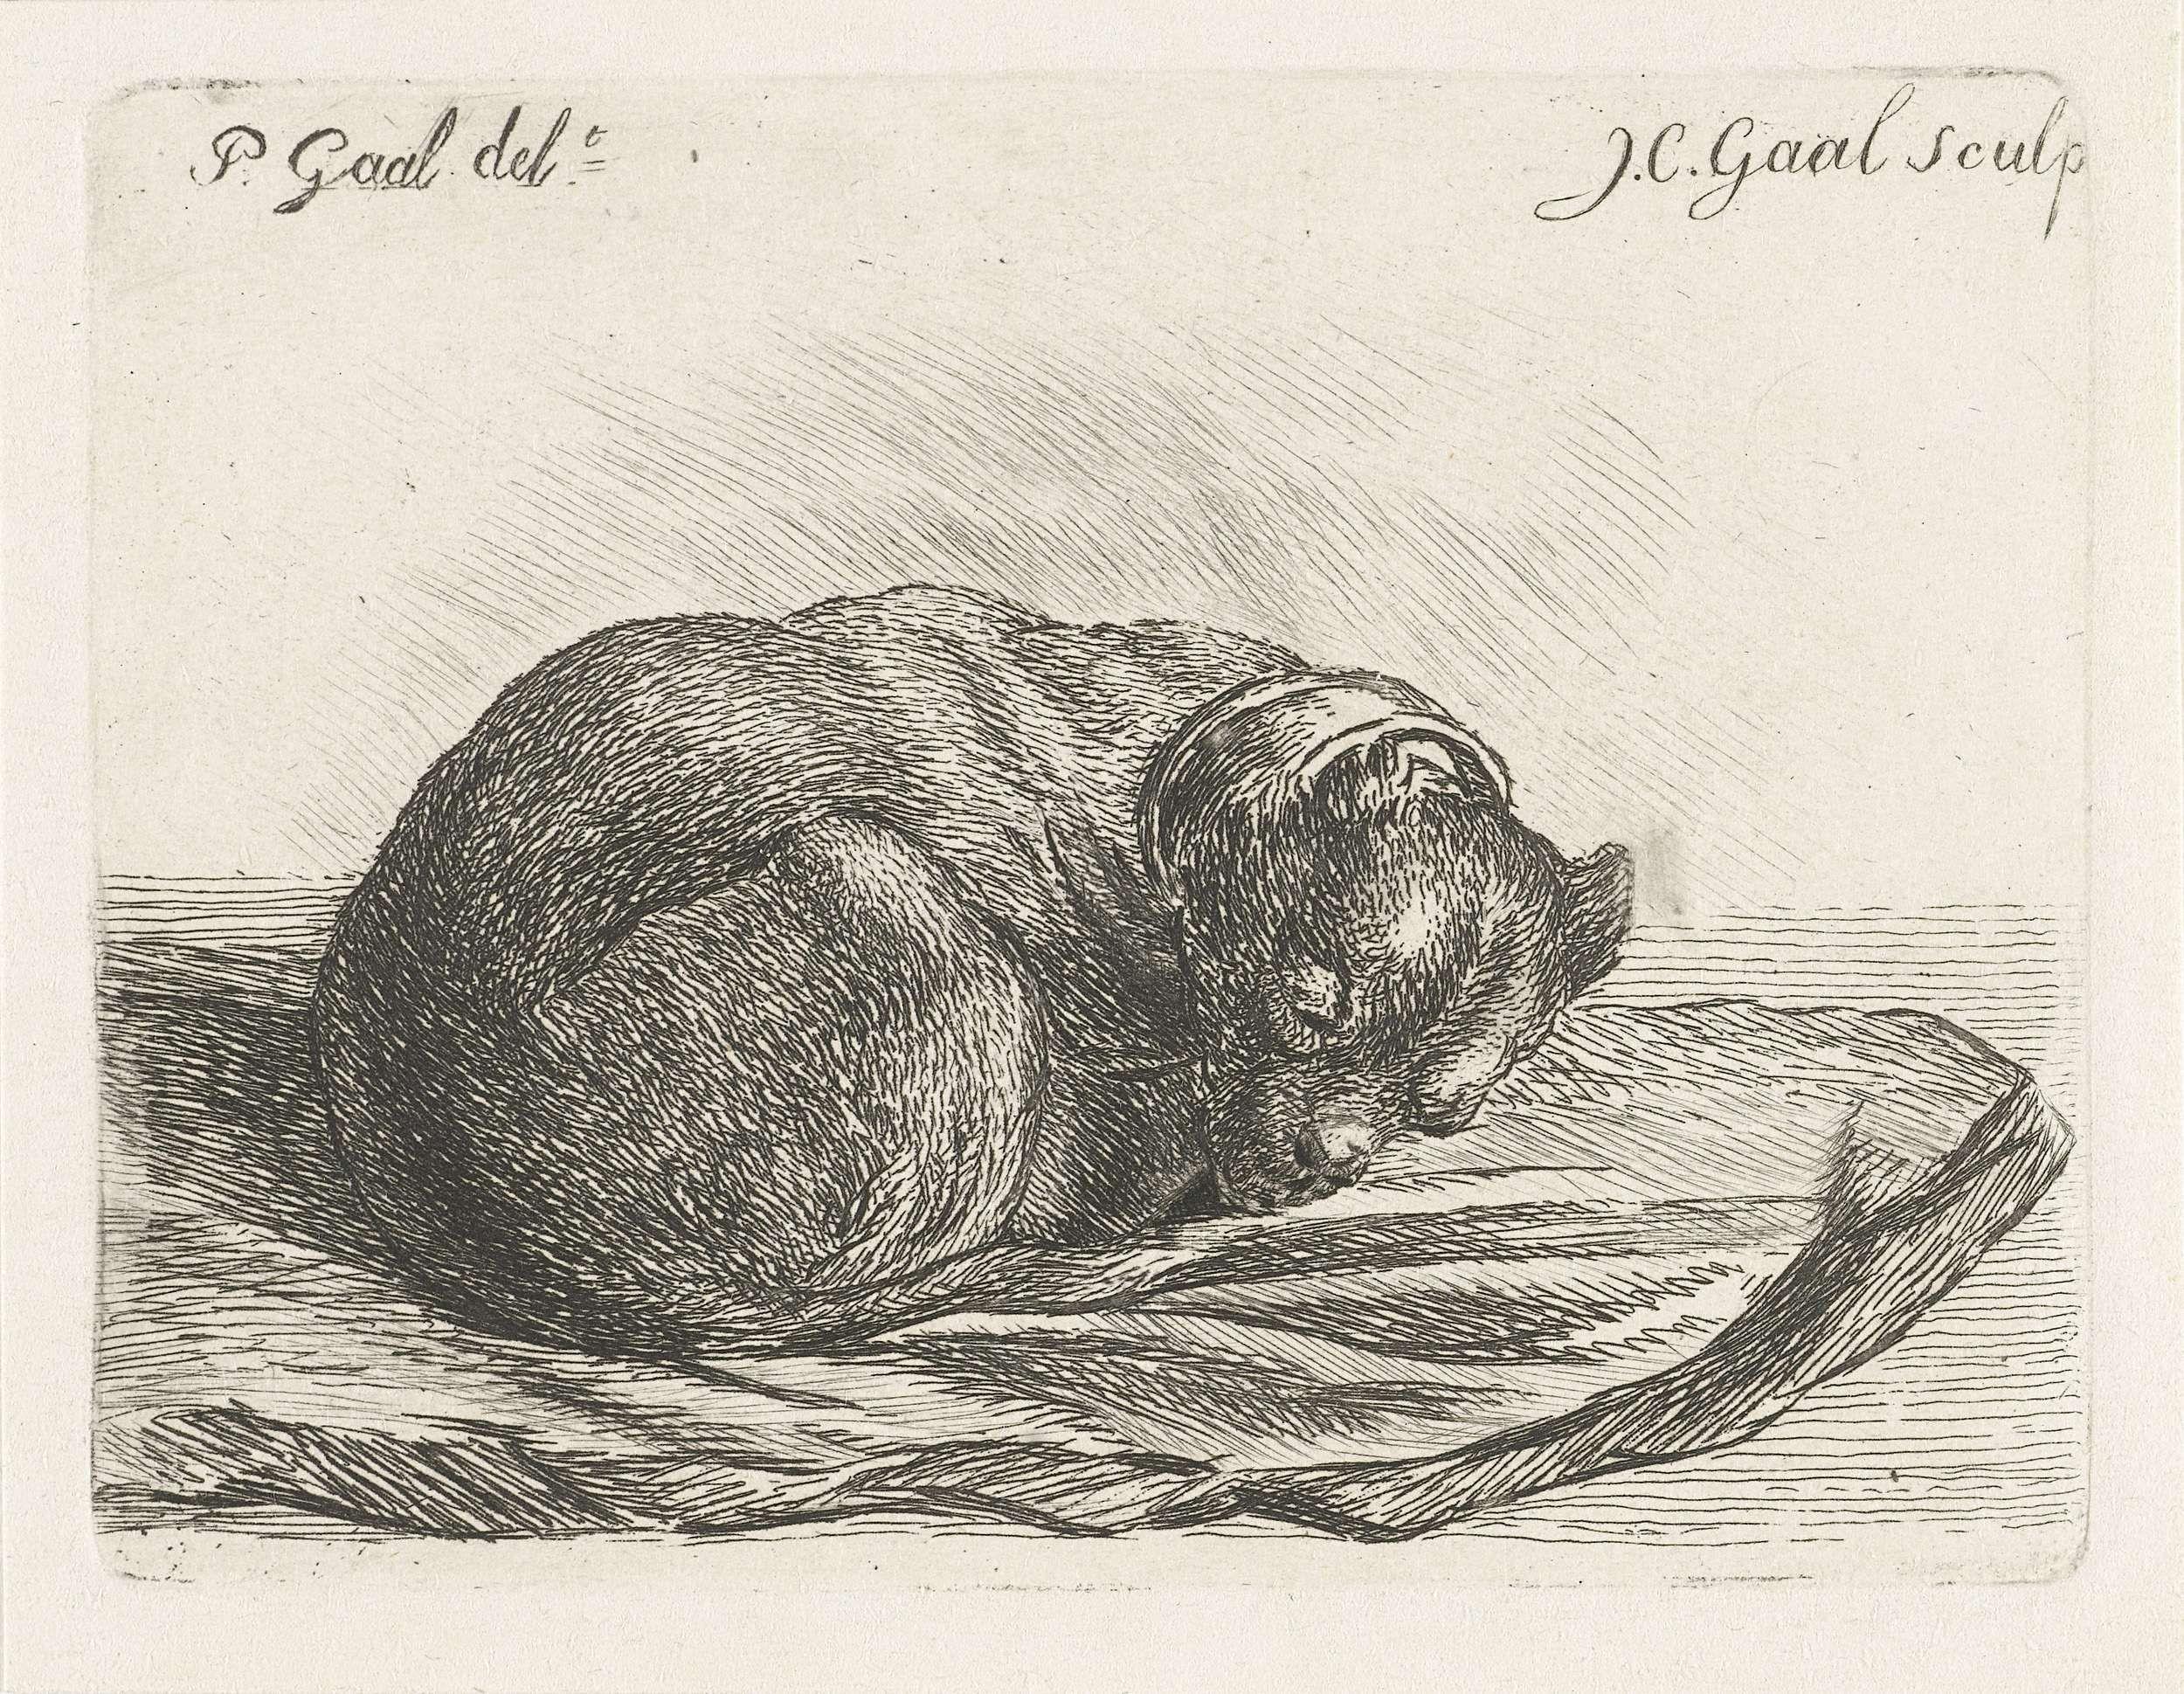 Jacobus Cornelis Gaal | Slapende hond, liggend op een deken, Jacobus Cornelis Gaal, 1851 |